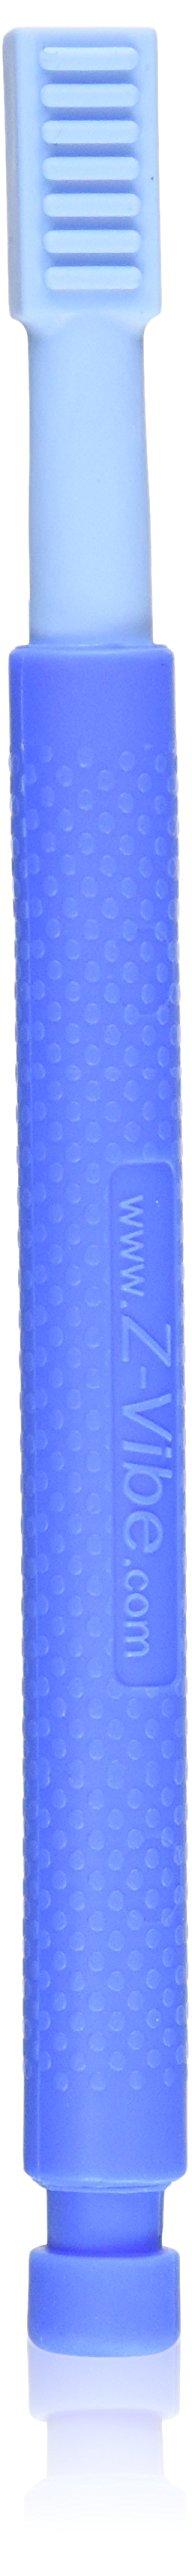 ARK's Z-Vibe Oral Stimulator for Speech & Feeding (Royal Blue)